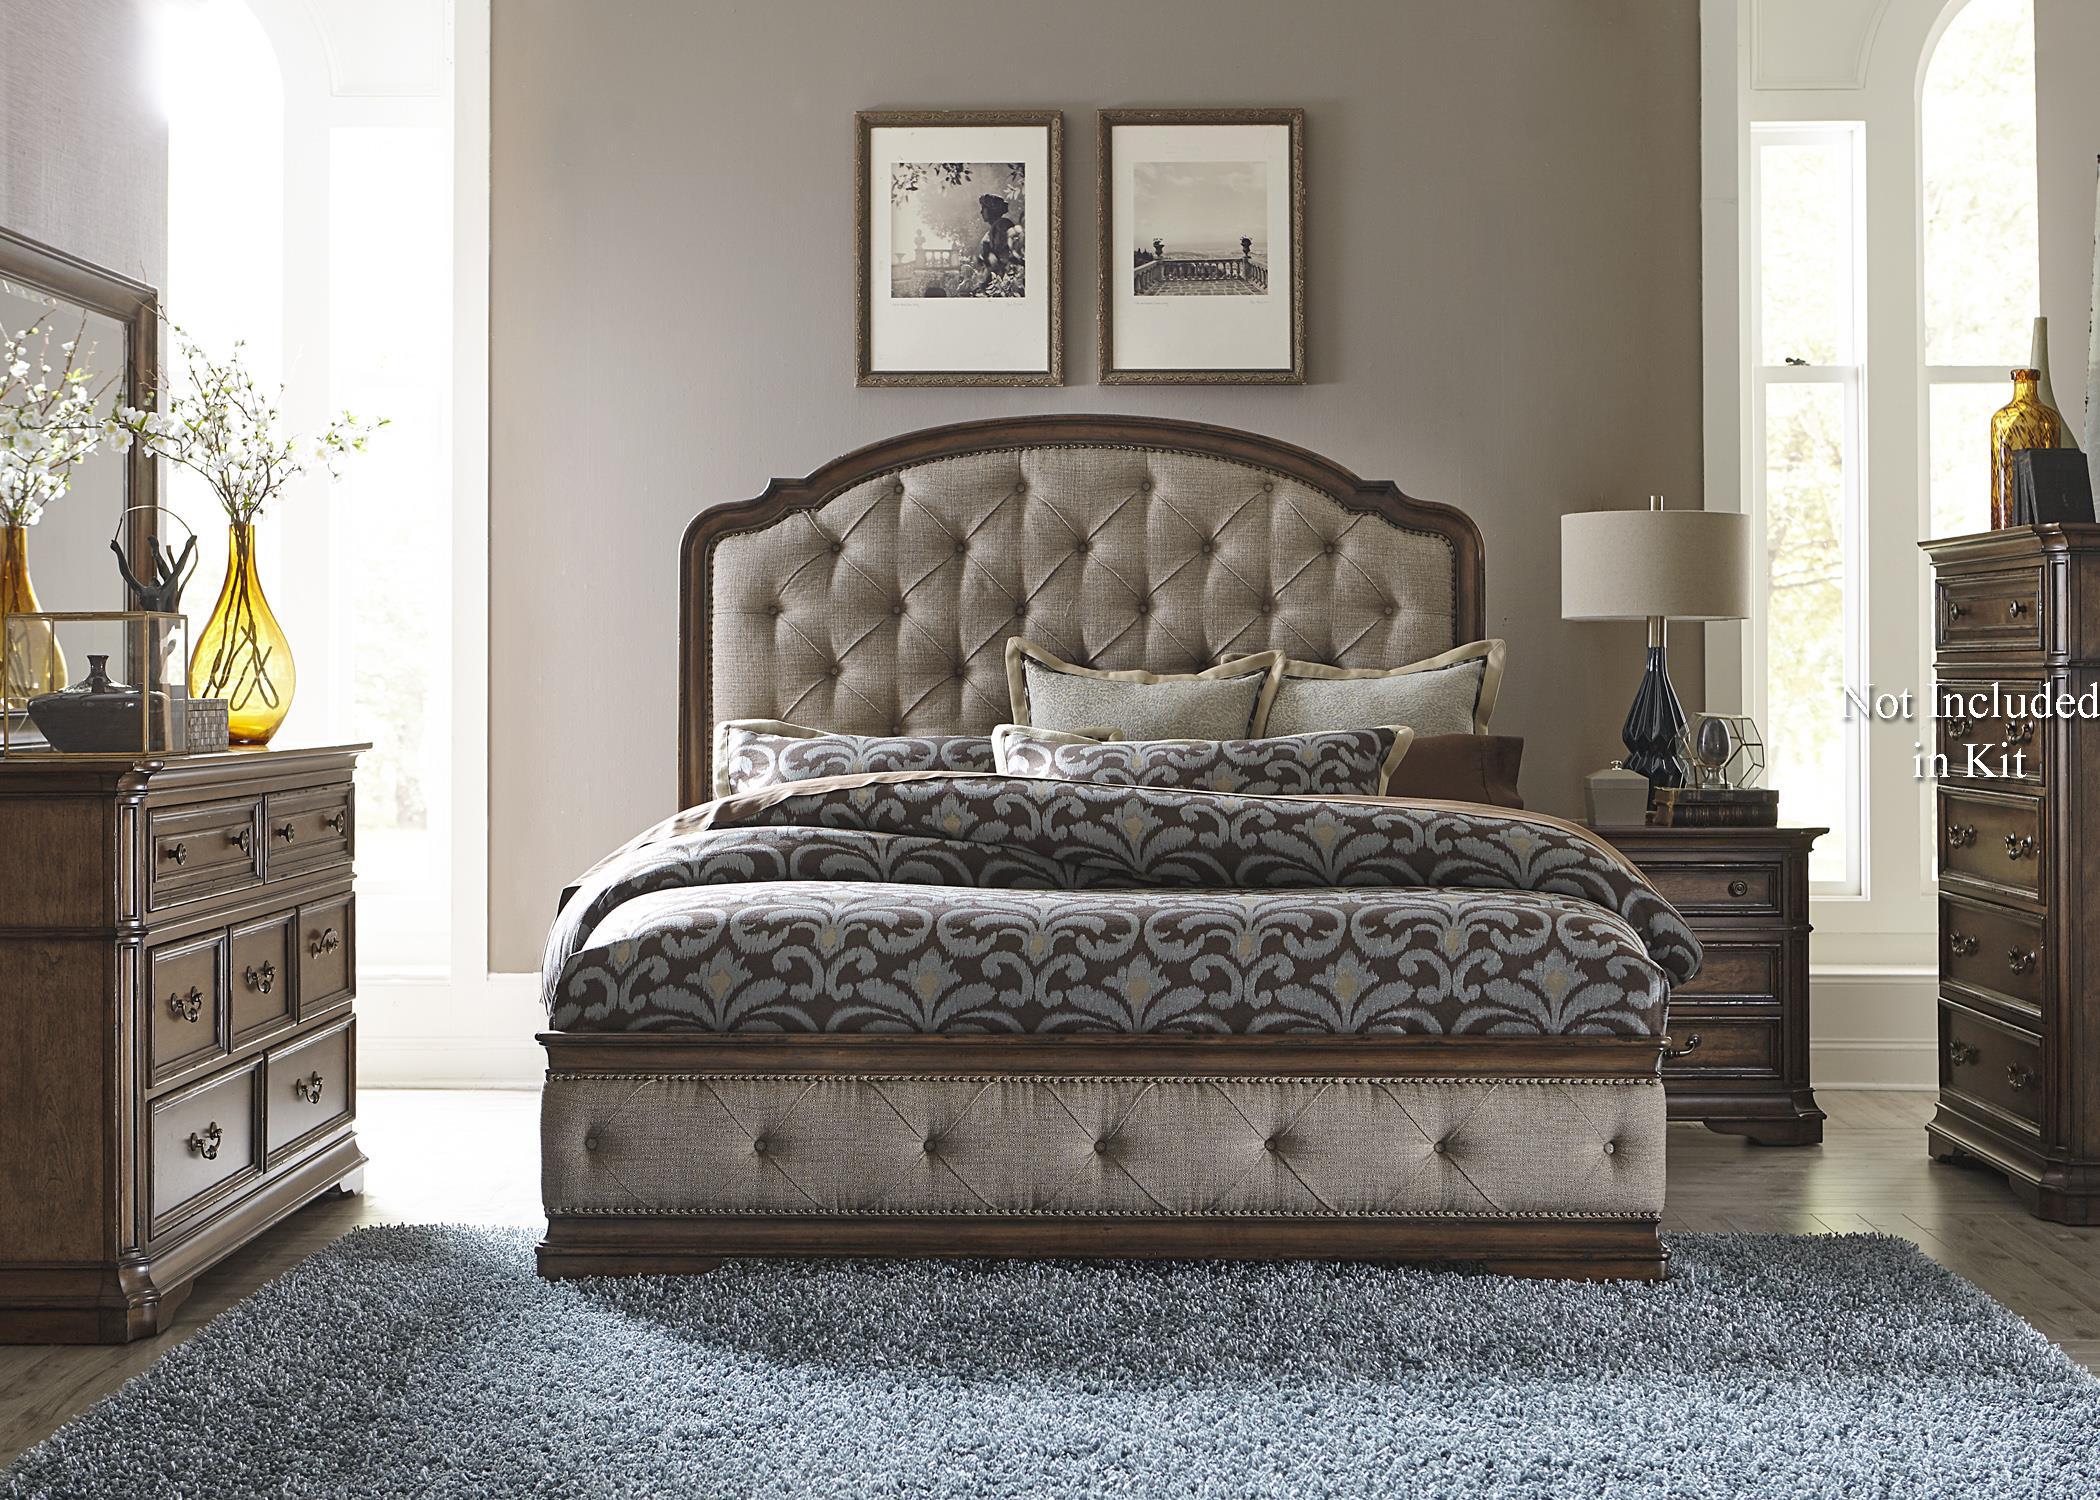 Liberty furniture amelia 487 br qubdmn queen bedroom group great american home store bedroom for American furniture warehouse bedroom furniture